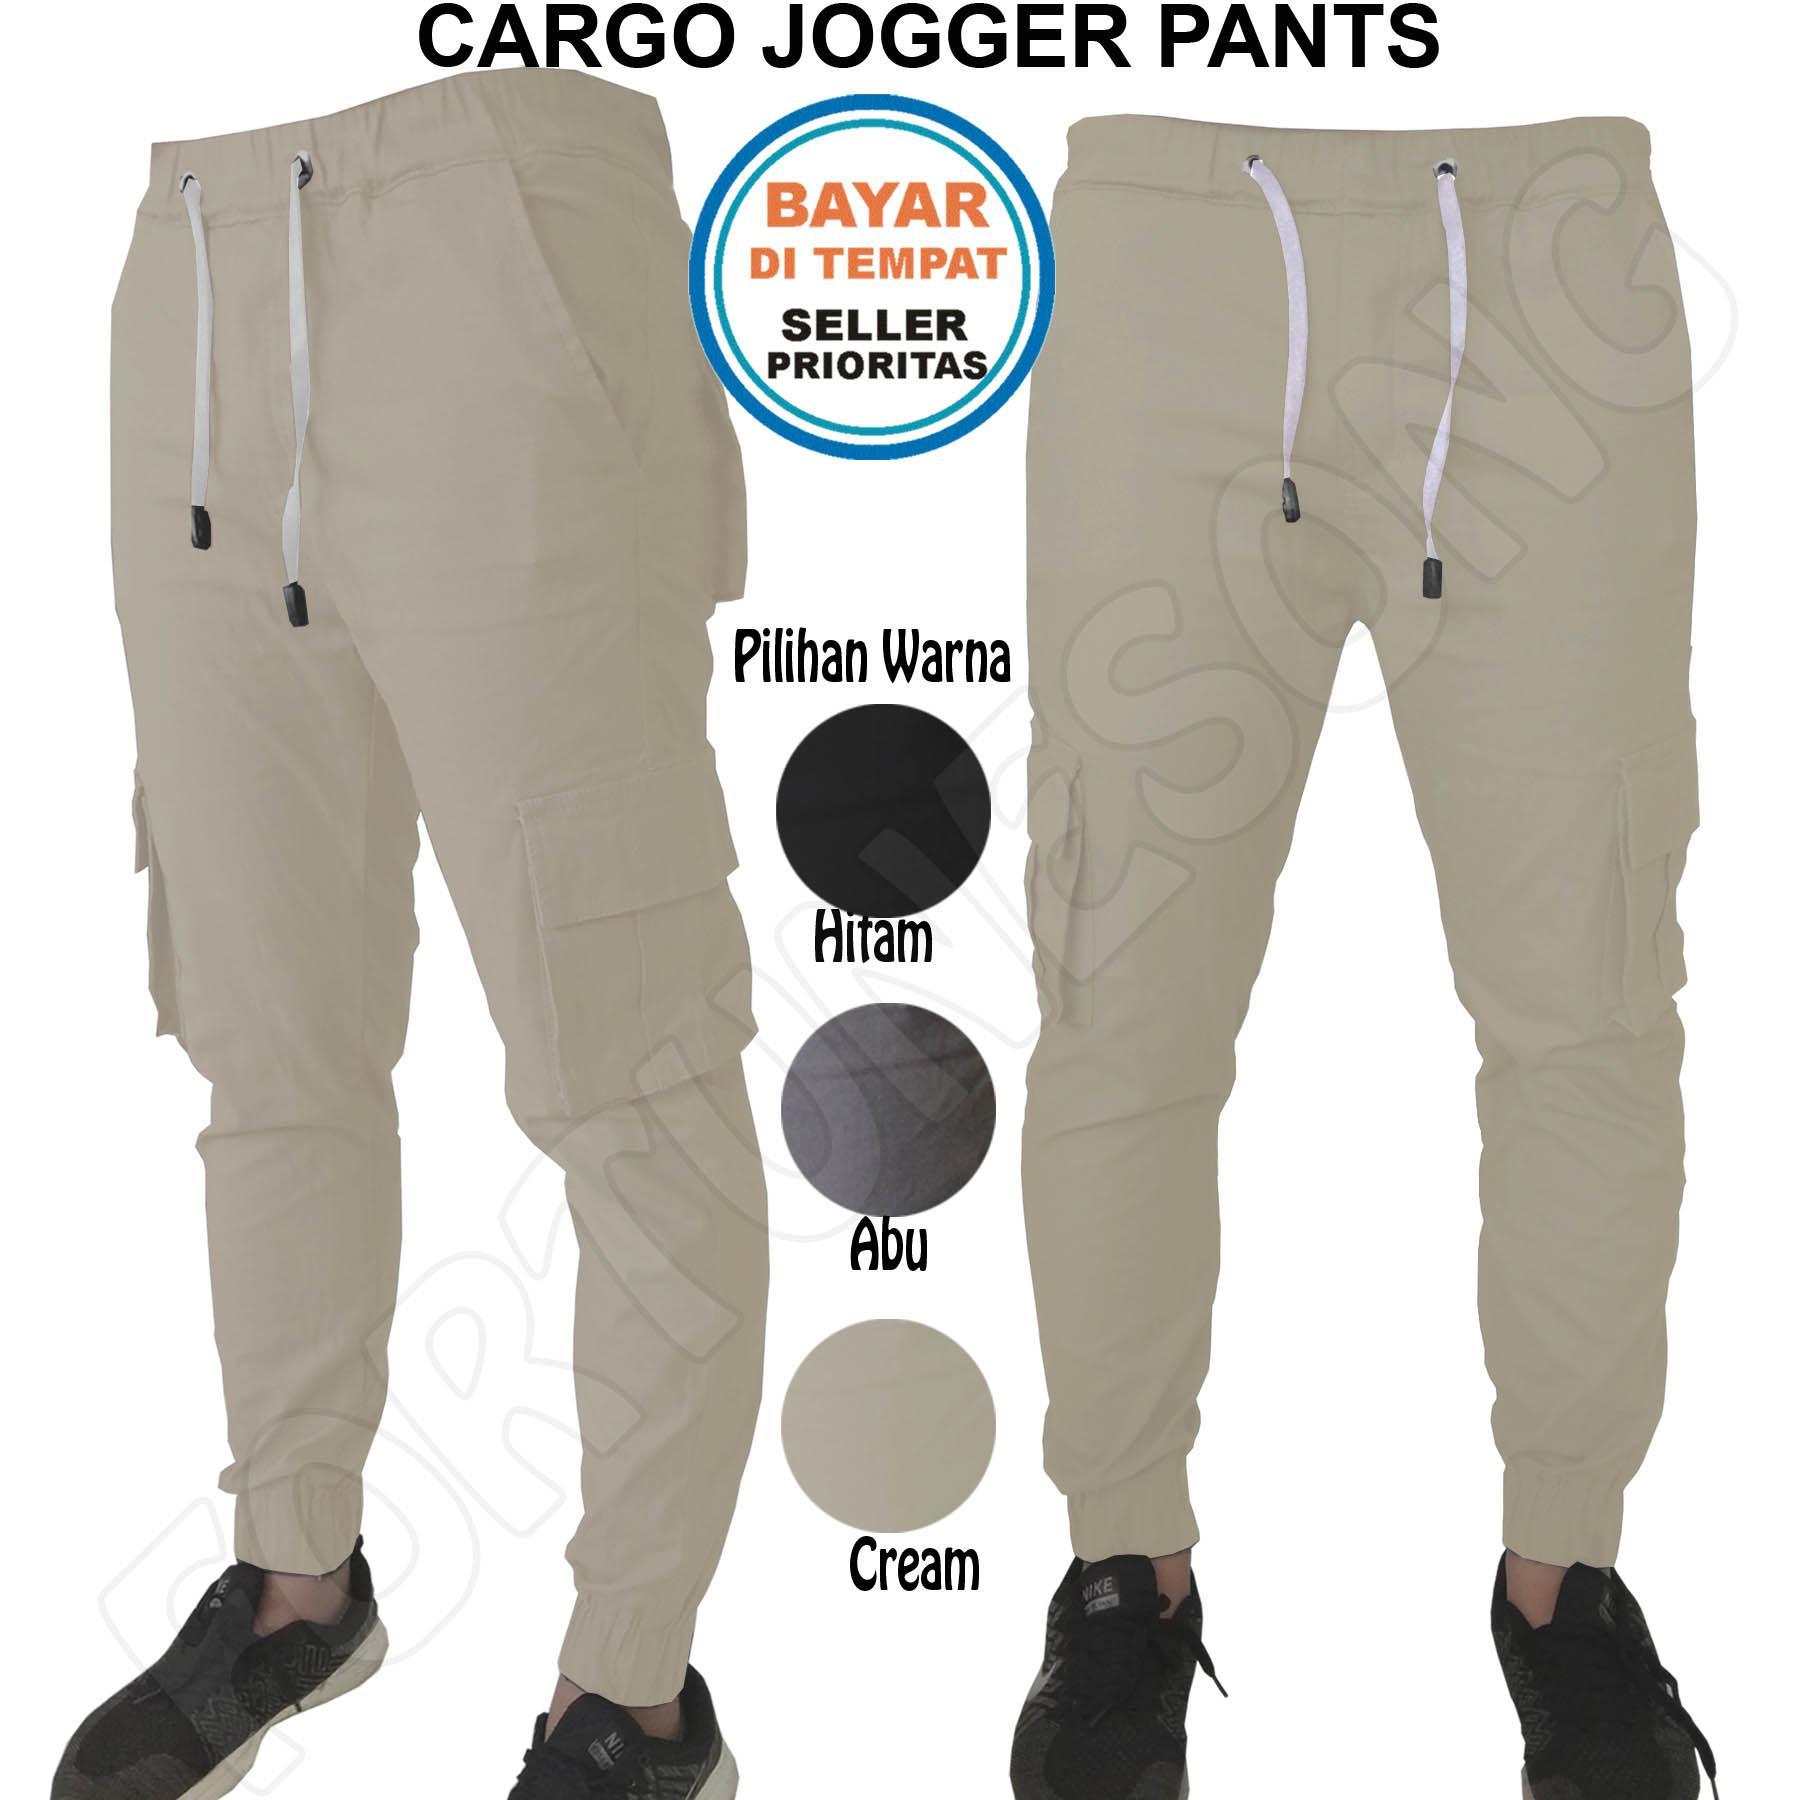 Fs'Fashion-Celana Joger Panjang Pria Chino Cotton Slimfit [Abu, Cream dan Hitam]